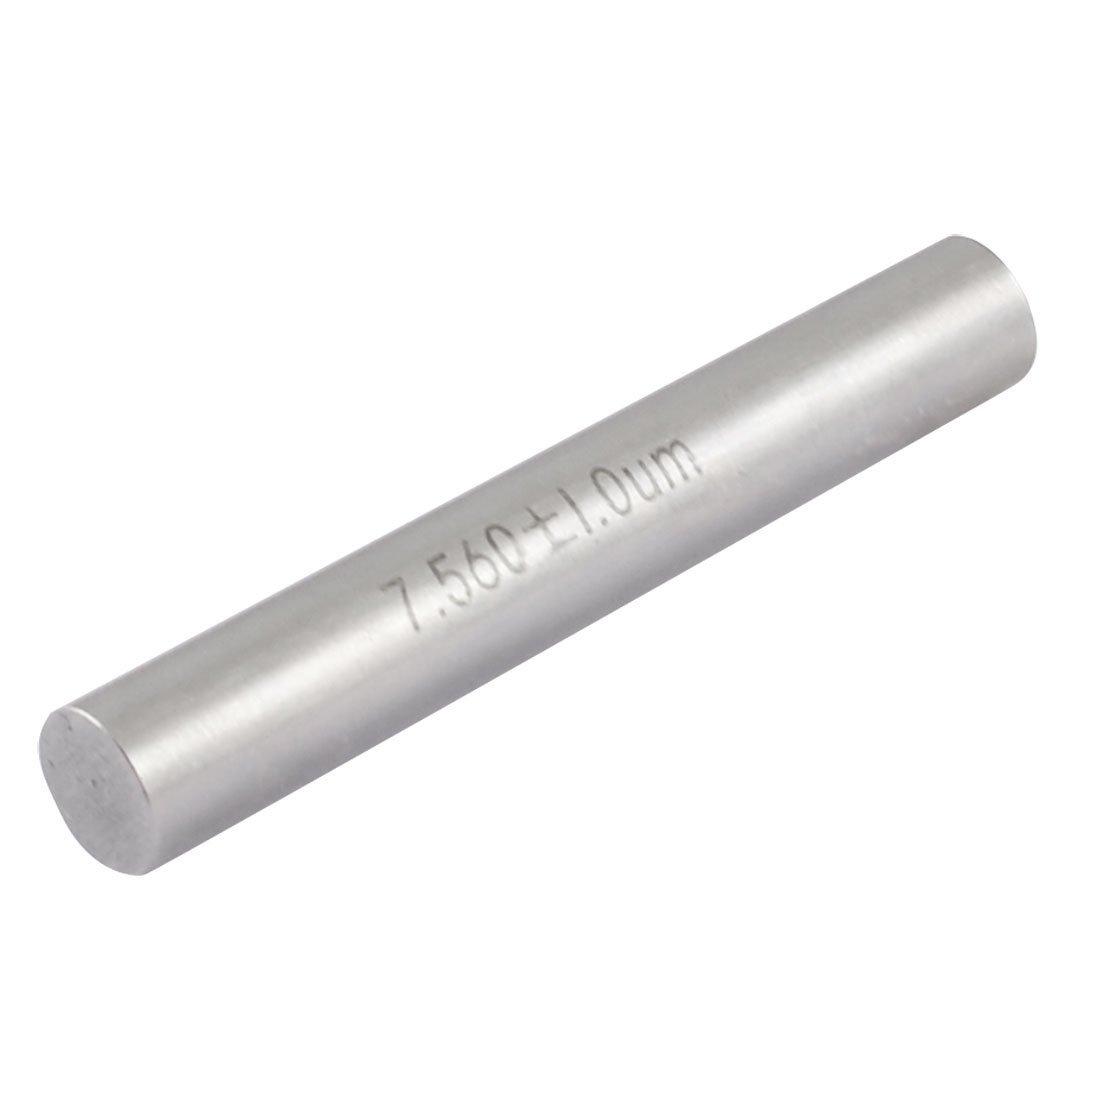 7.56mm Diameter Tungsten Carbide Plug Pin Gage Gauge w Plastic Case Sourcingmap a13030600ux0383